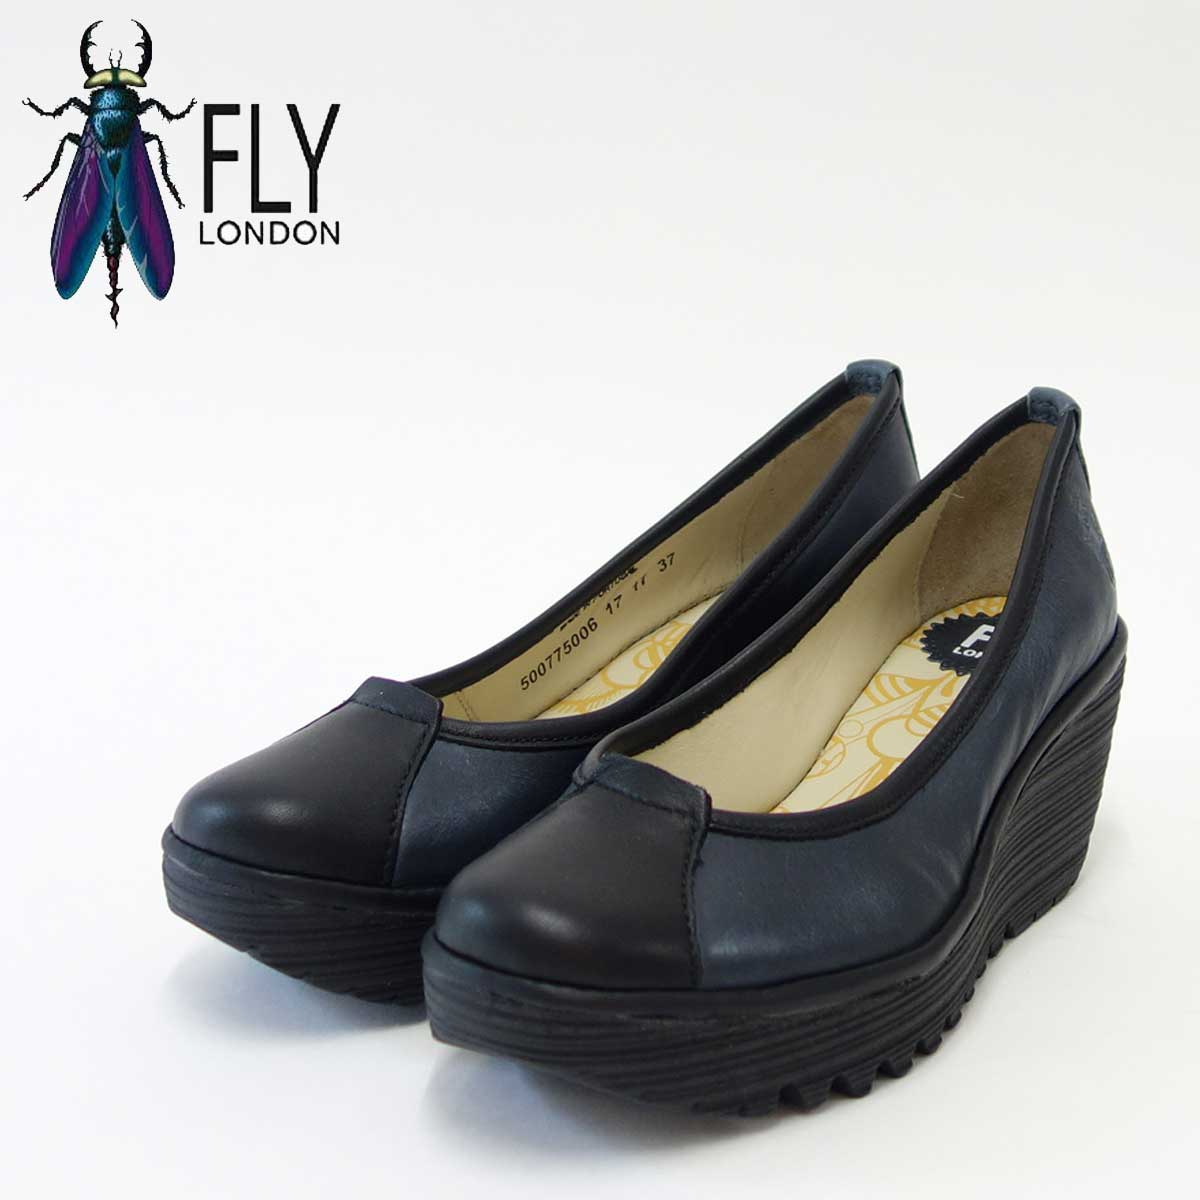 FLY LONDON フライロンドンYERB775FLY 500775 GRACE/REEFポルトガル製ウェッジパンプス「靴」